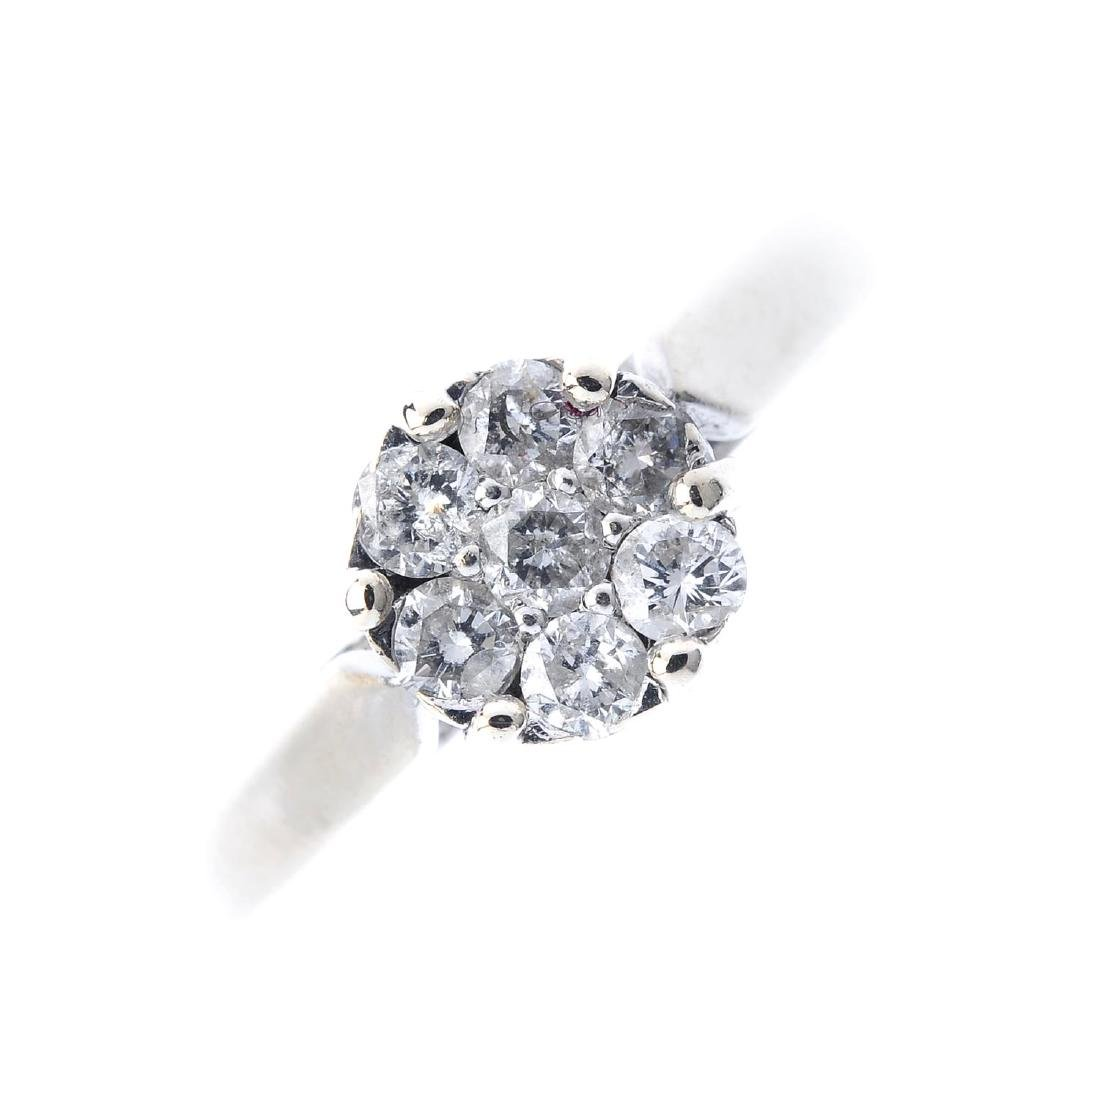 A diamond cluster ring. The brilliant-cut diamond,